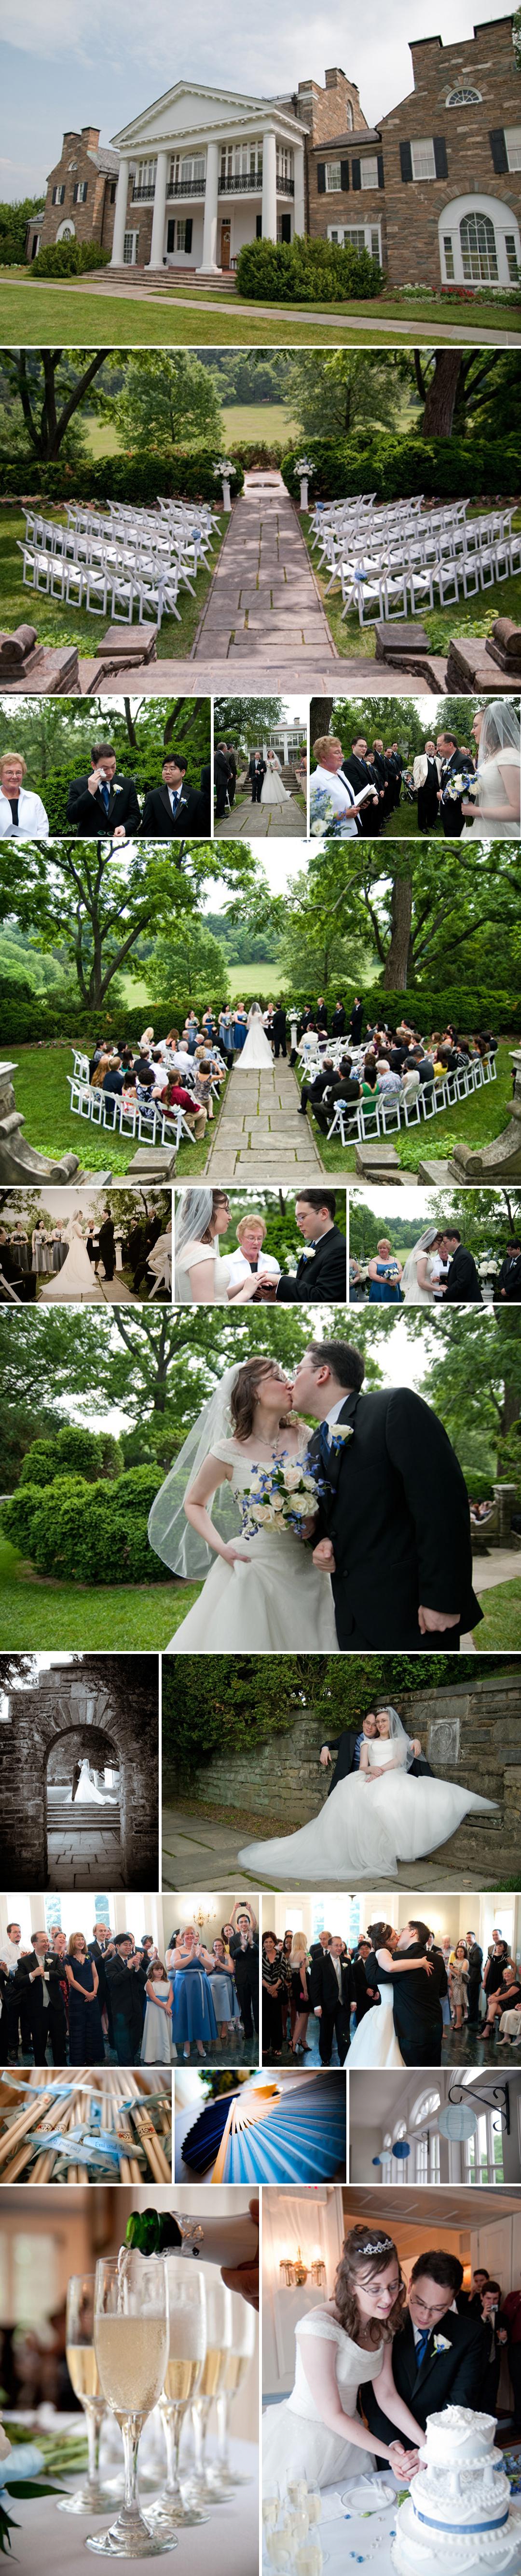 glenview mansion wedding photos